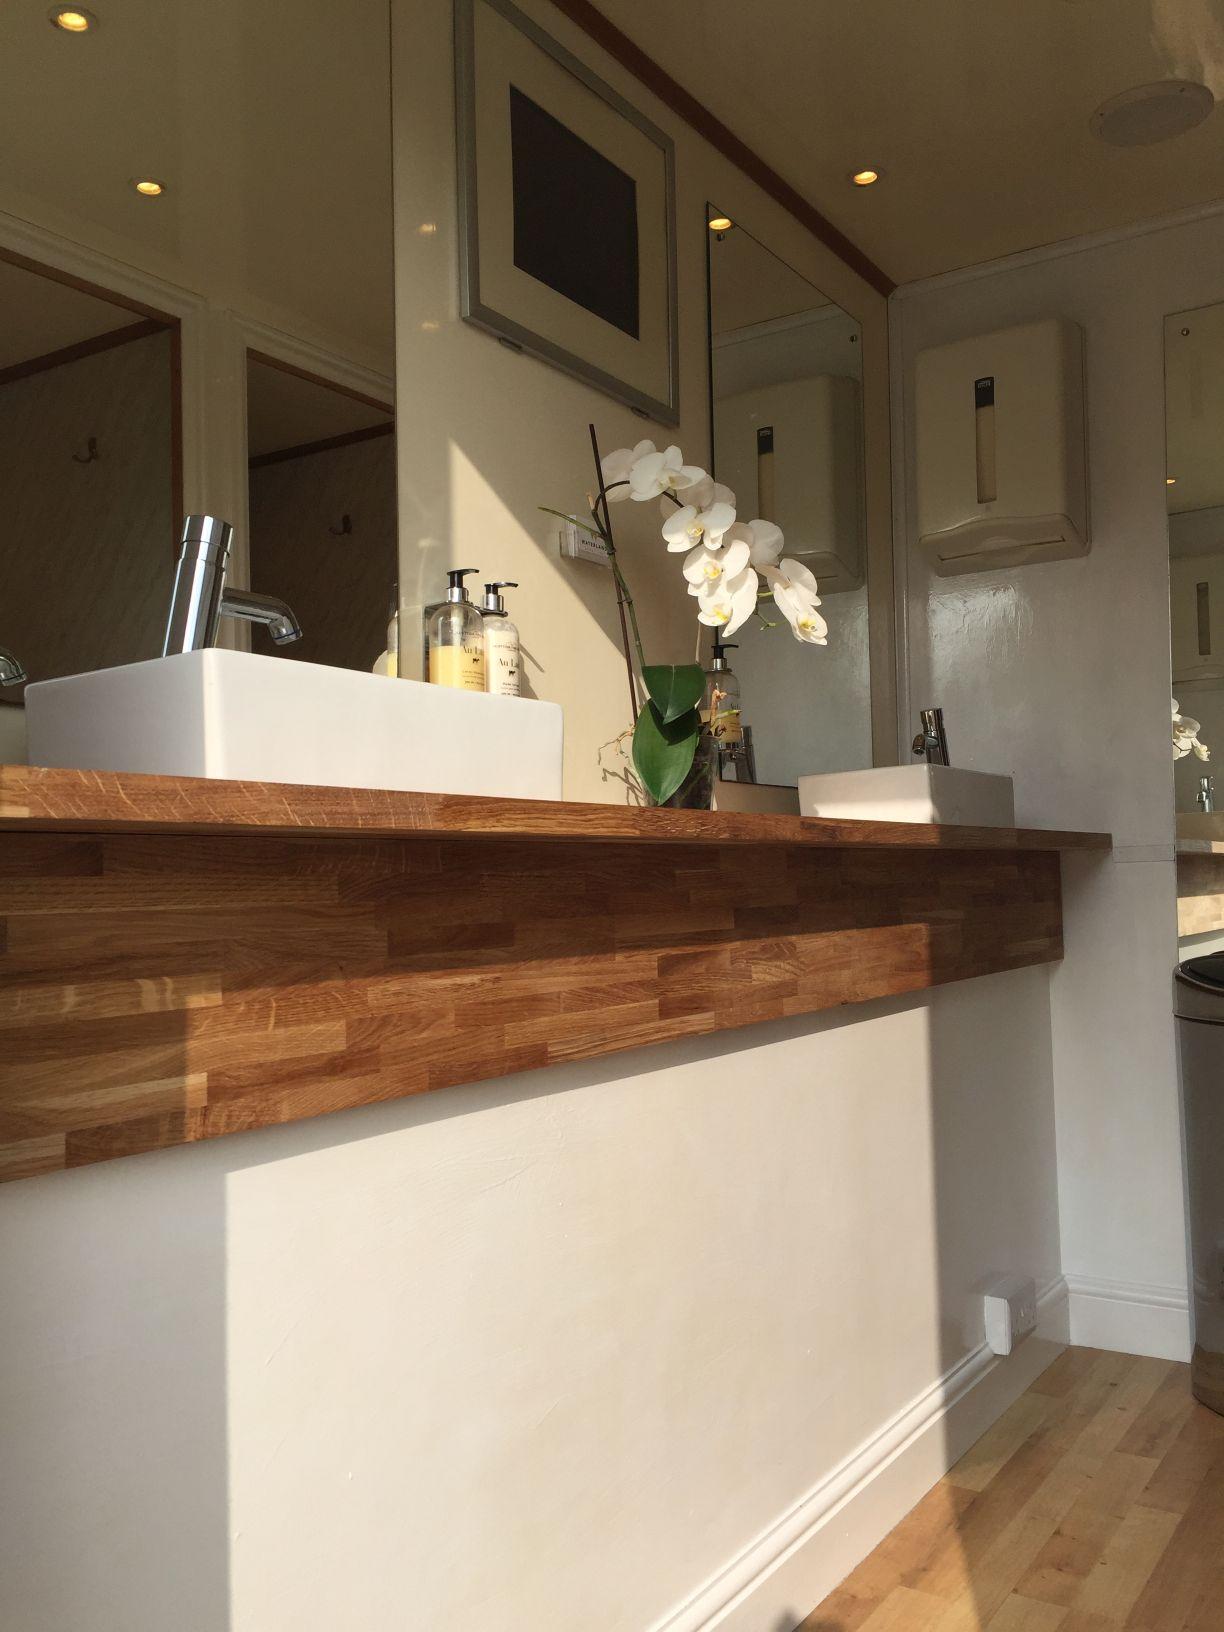 Luxury Toilets To Let | Luxury Portable Toilet & Loo Hire